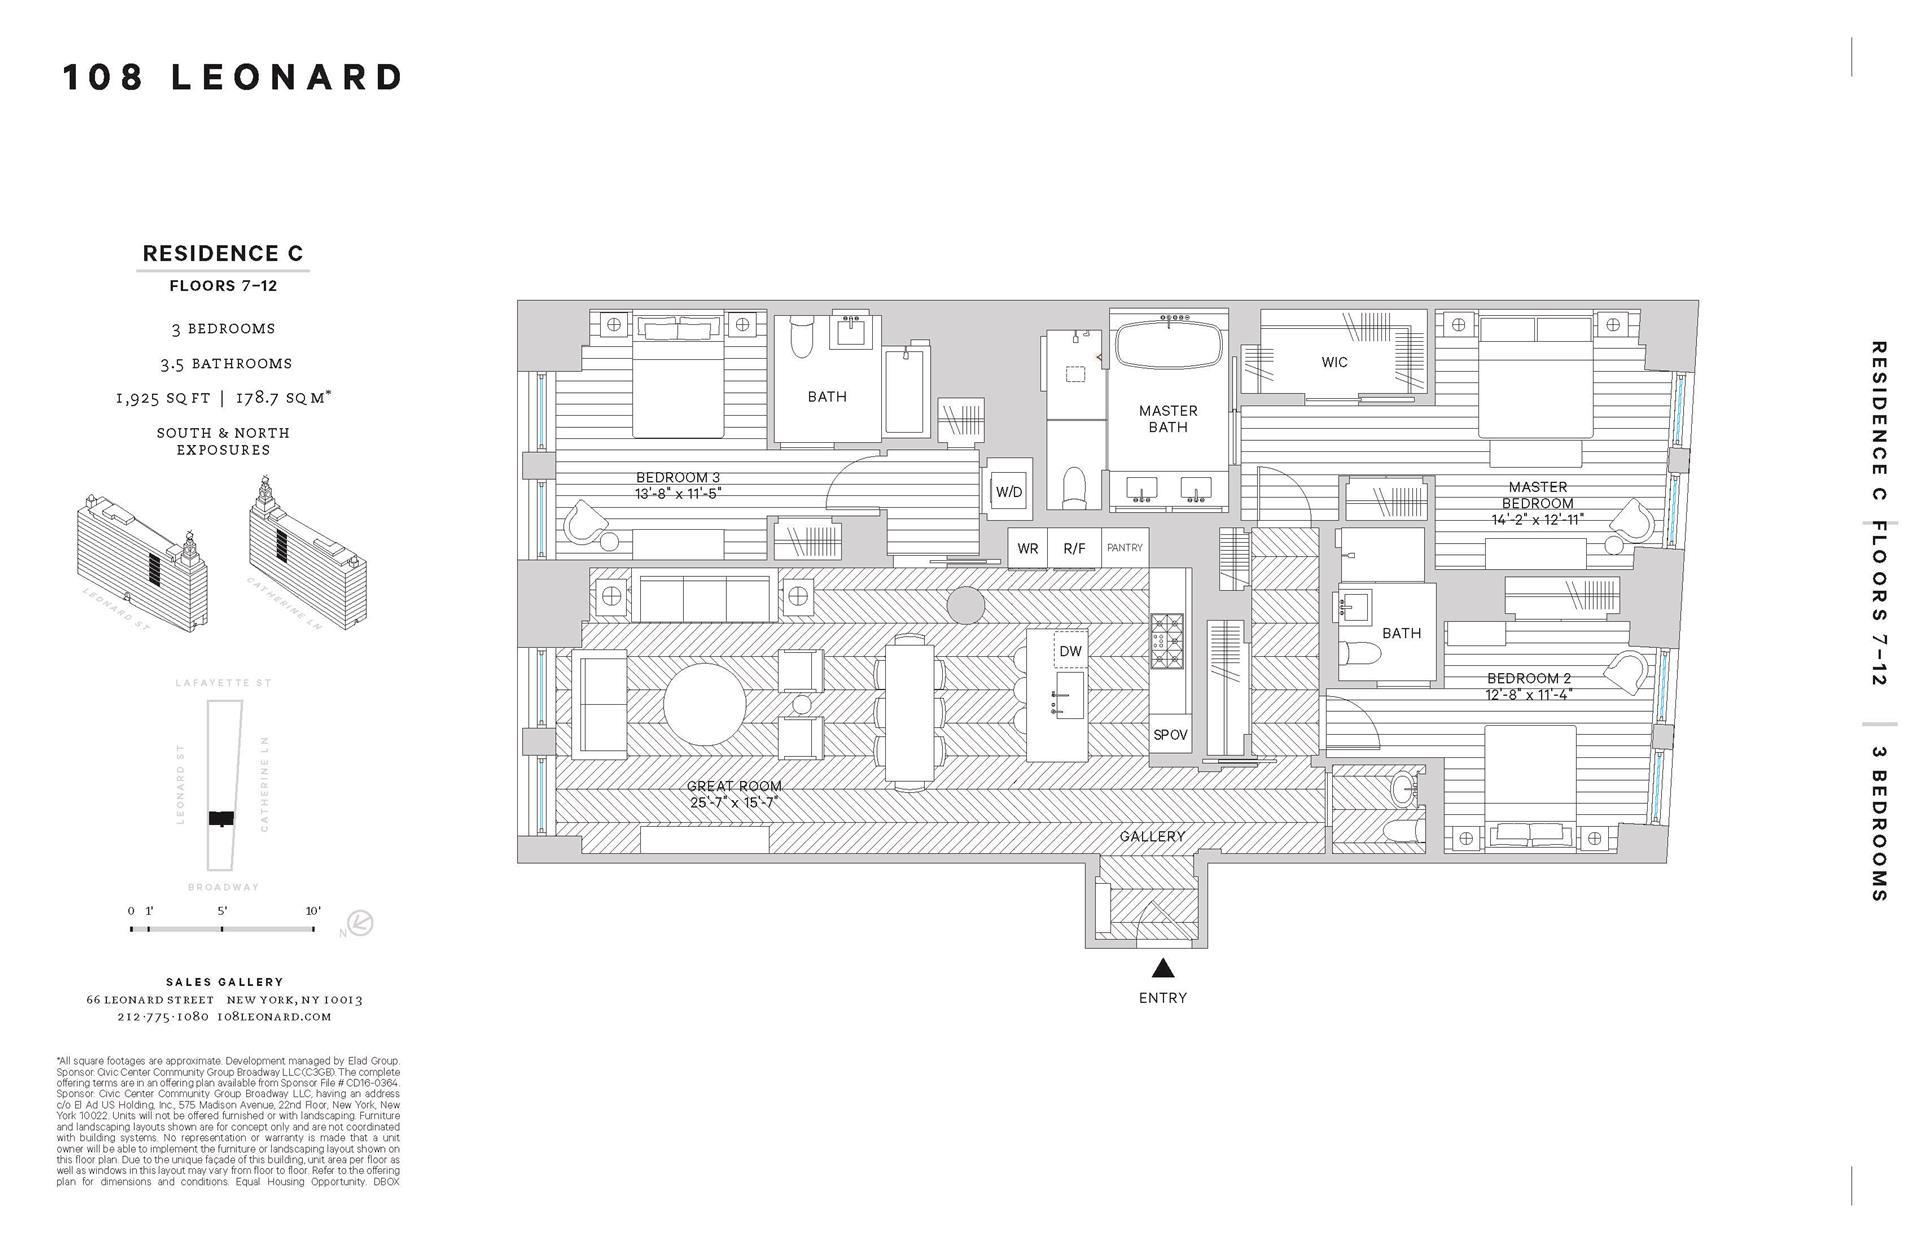 Floor plan of 108 Leonard St, 8C - TriBeCa, New York